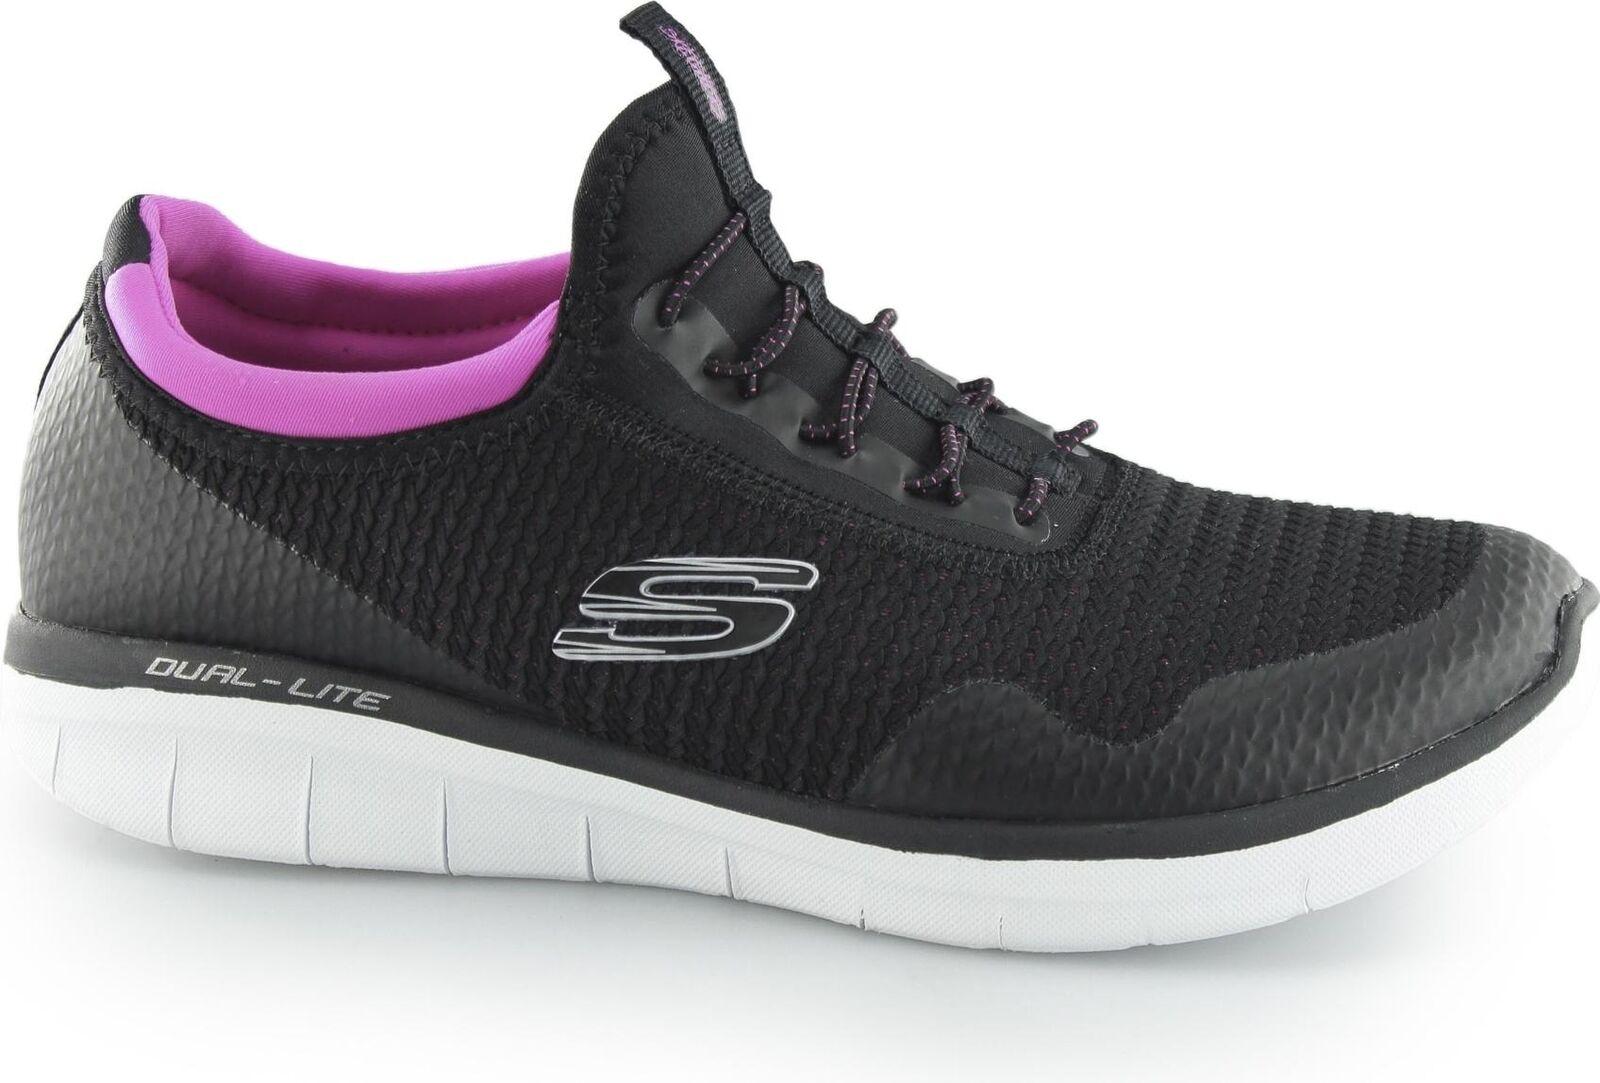 Skechers SYNERGY 2.0 2.0 2.0 - MIRROR IMAGE Ladies Womens Memory Foam Slip On Trainers cf2bfc